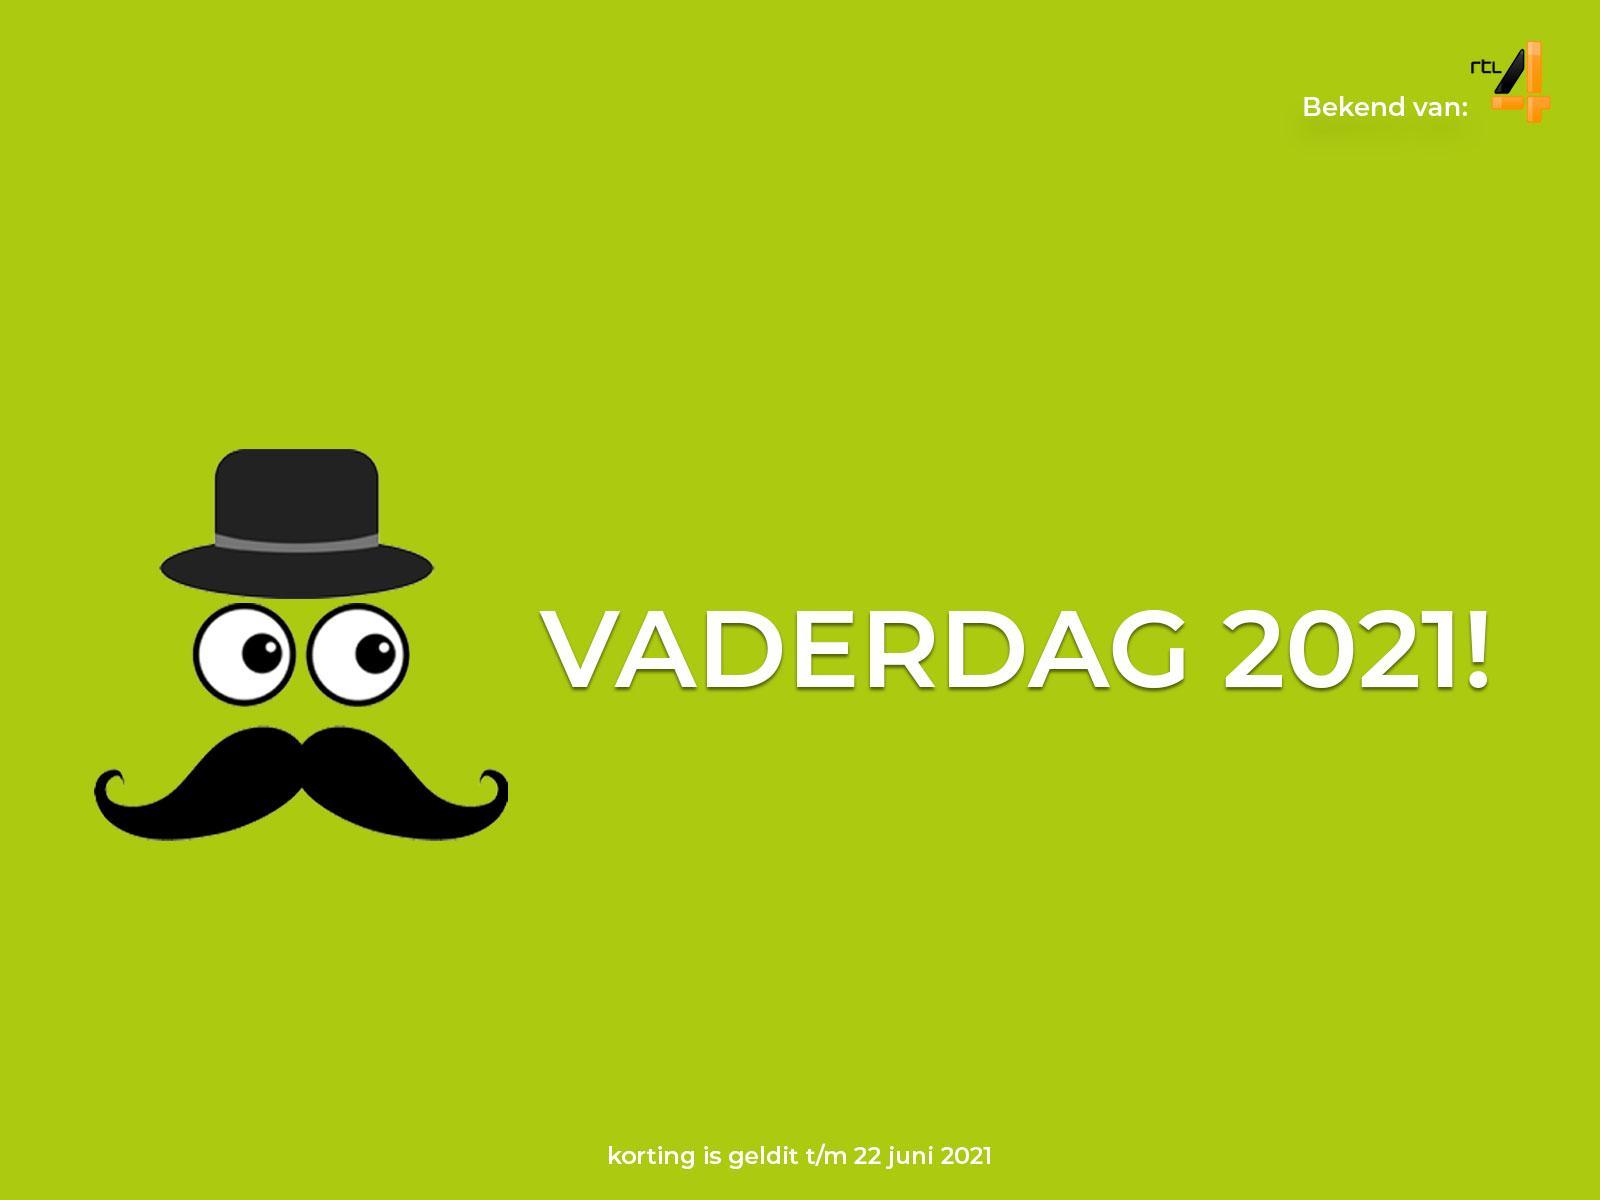 Vaderdag korting bij Vloerloods.nl